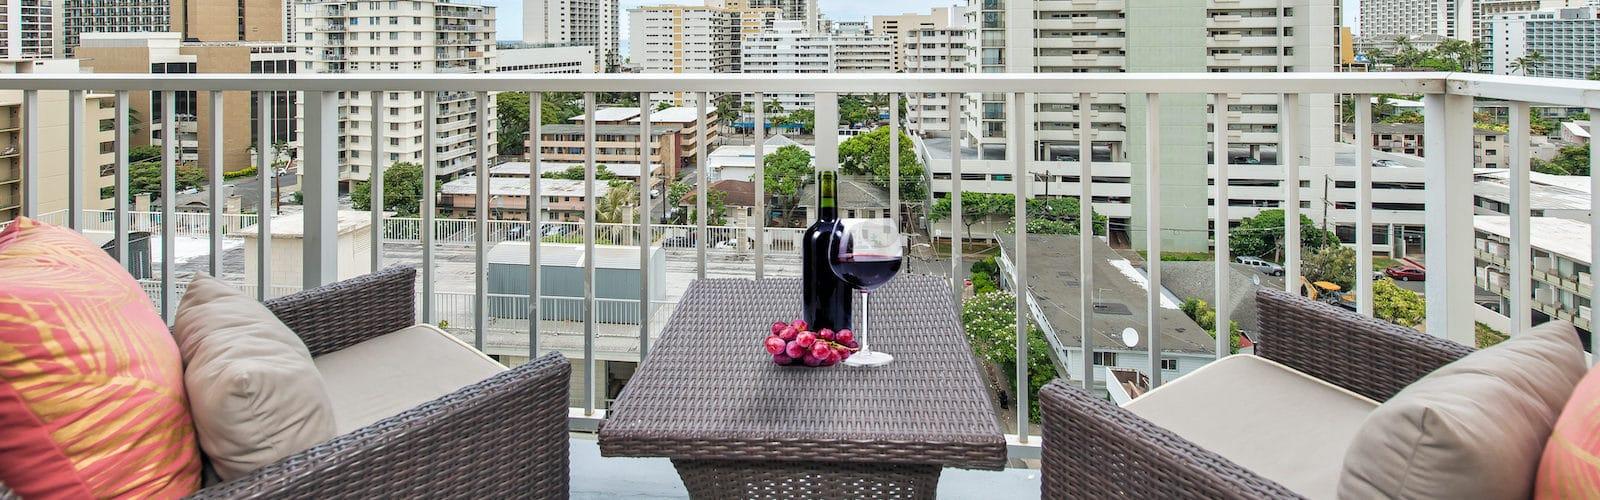 Benefits of Booking Vacation Rentals in Waikiki, Oahu, Hawaii